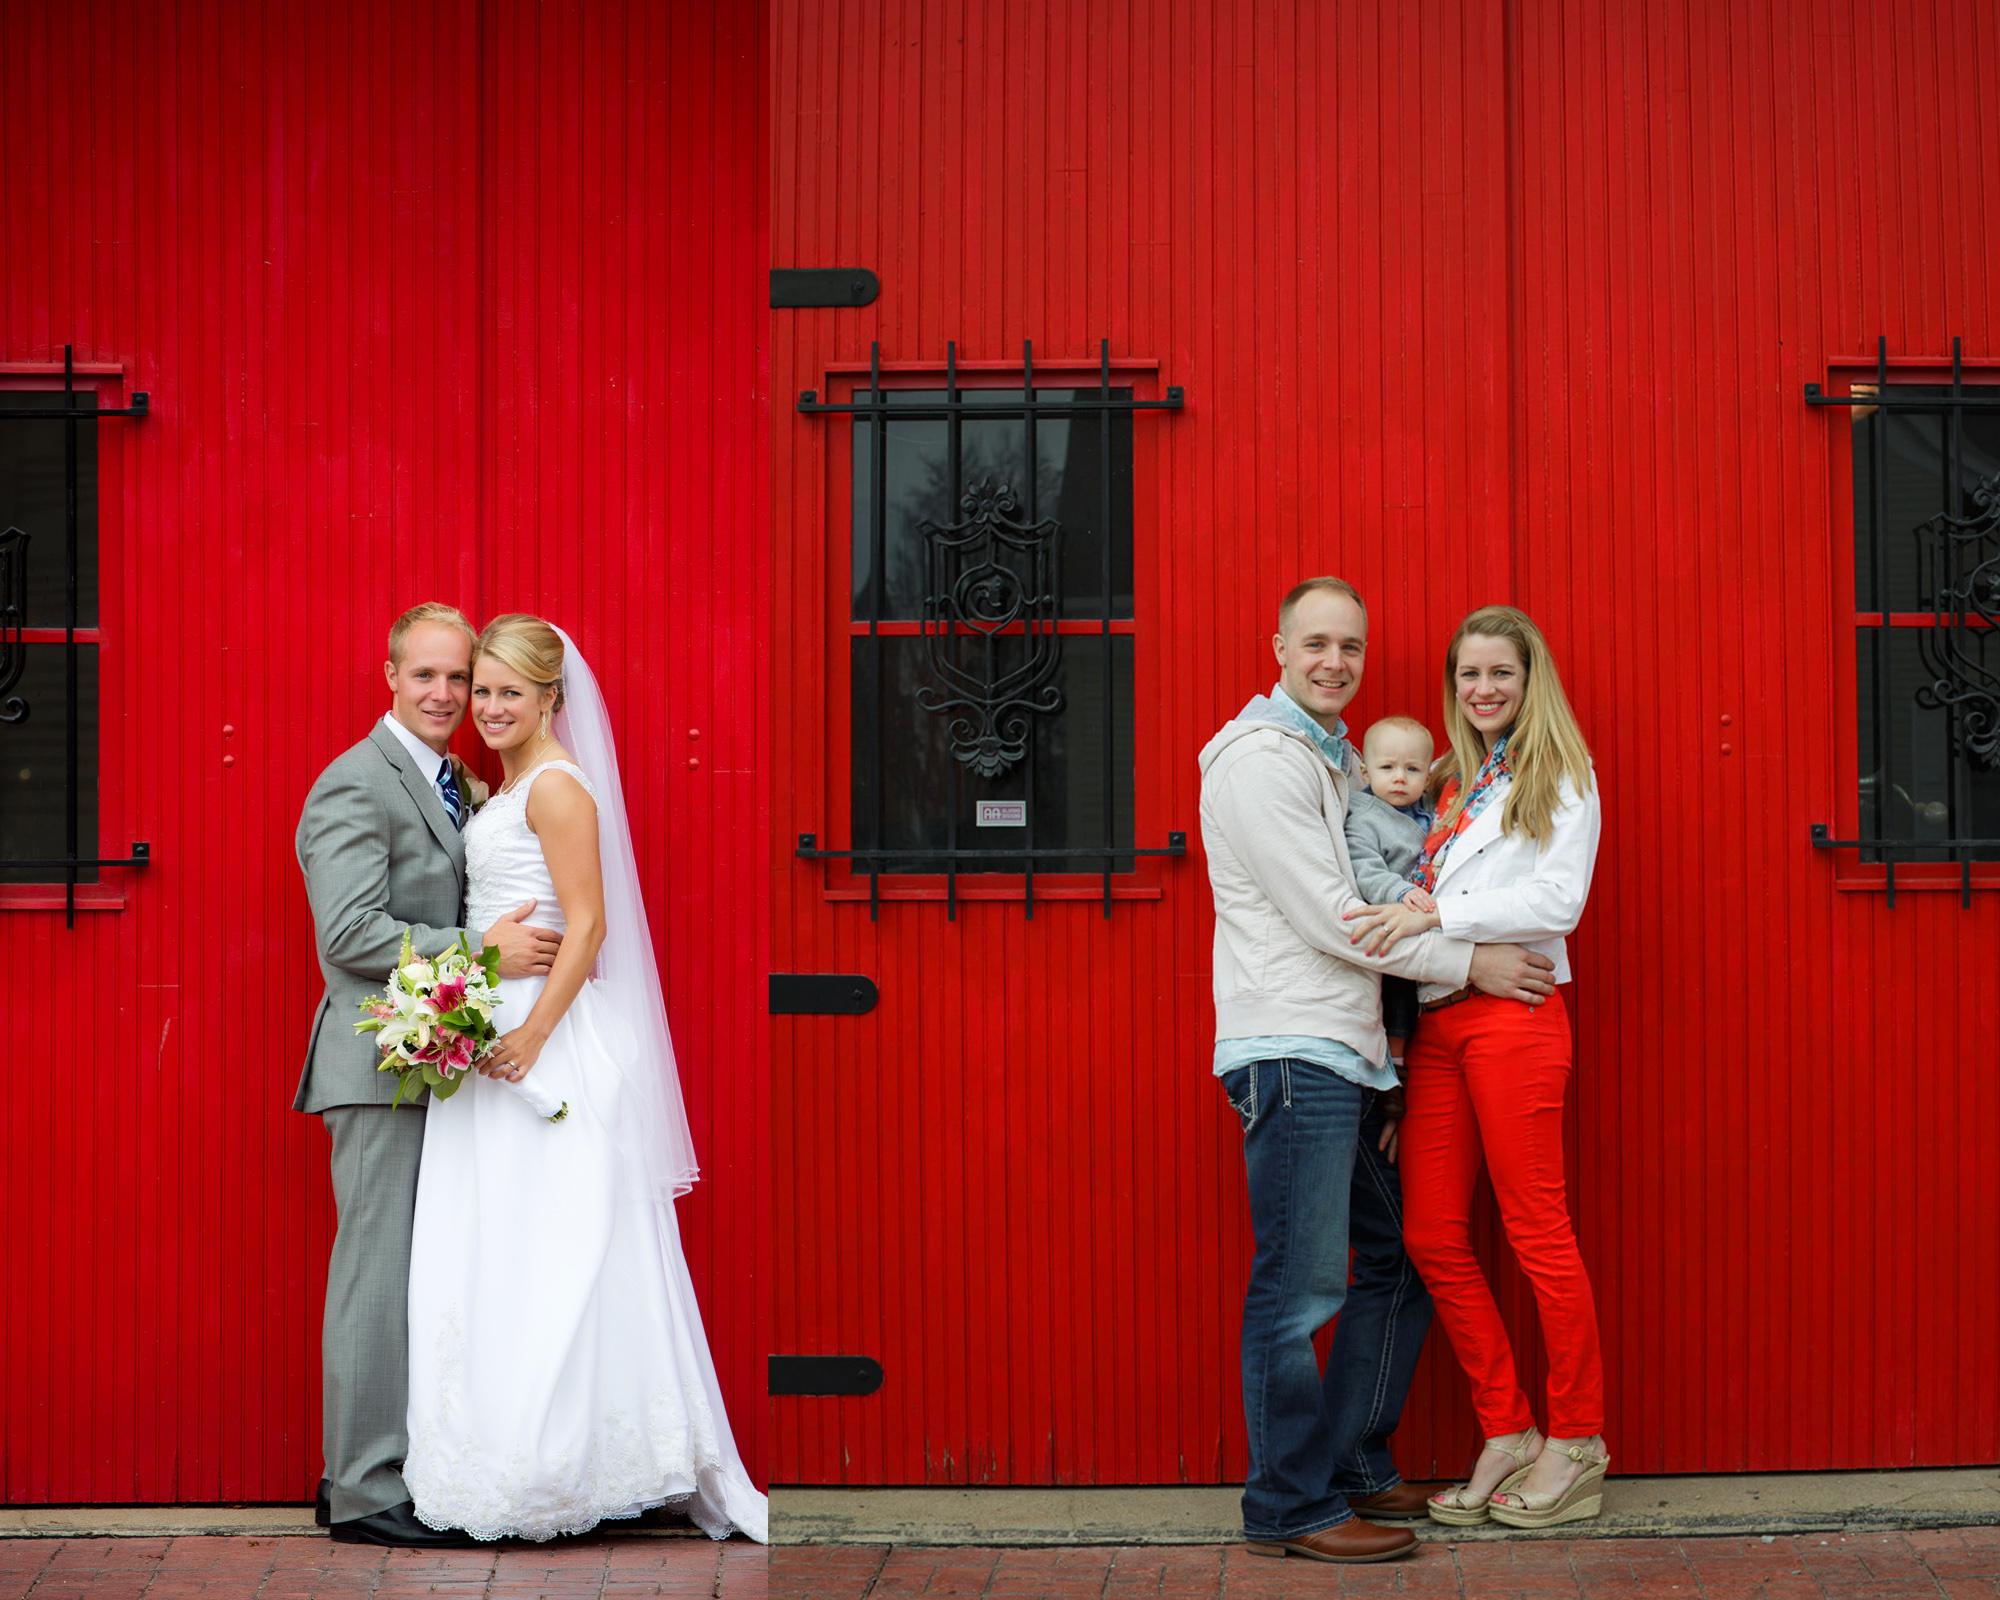 happilyeverafter_annarbor_wedding_013